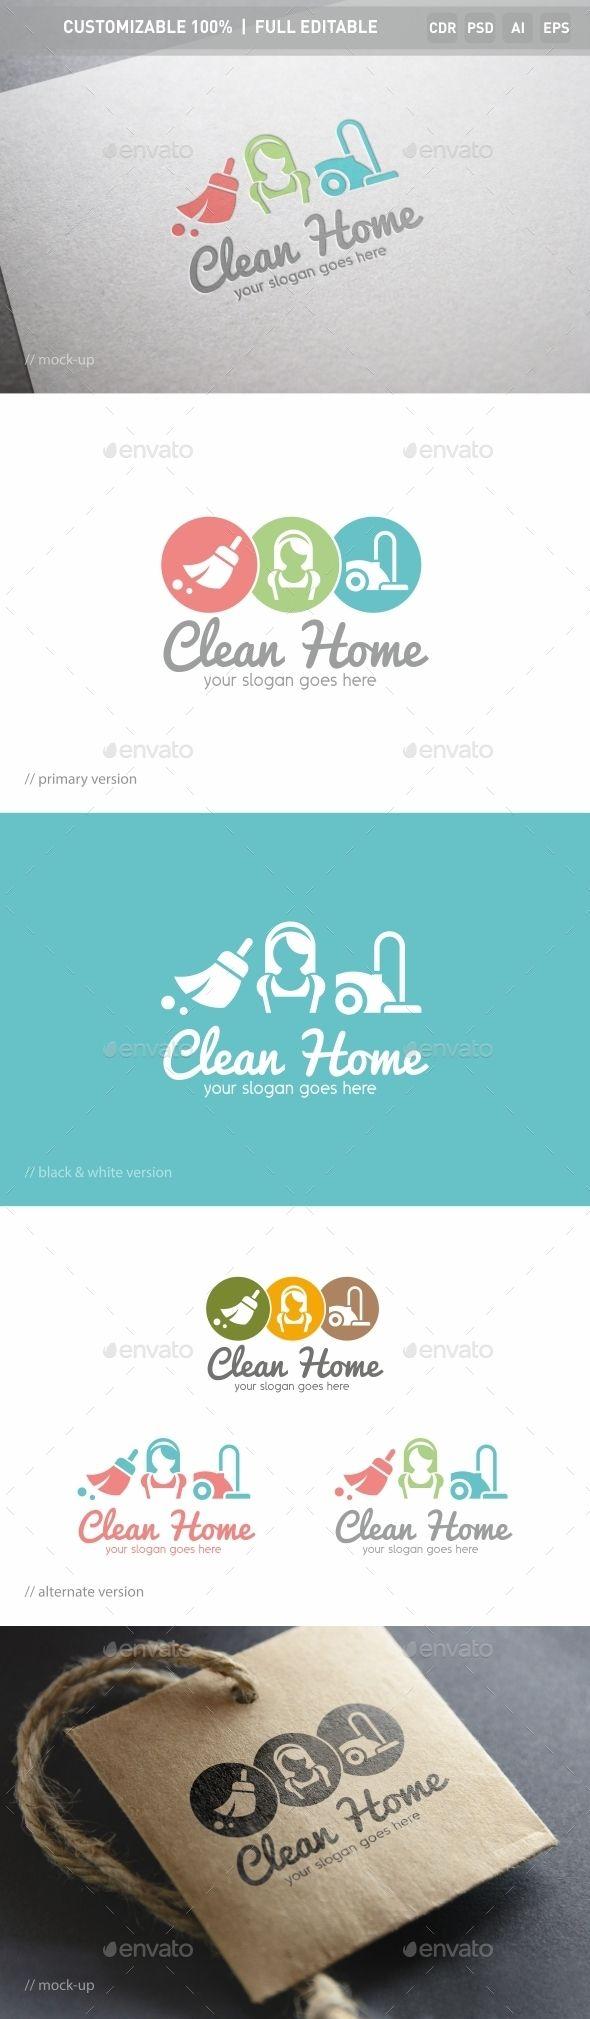 30 examples of cleaning services logo design cleaning service clean home logo template cleaning companiescleaning businesslogo design baanklon Gallery